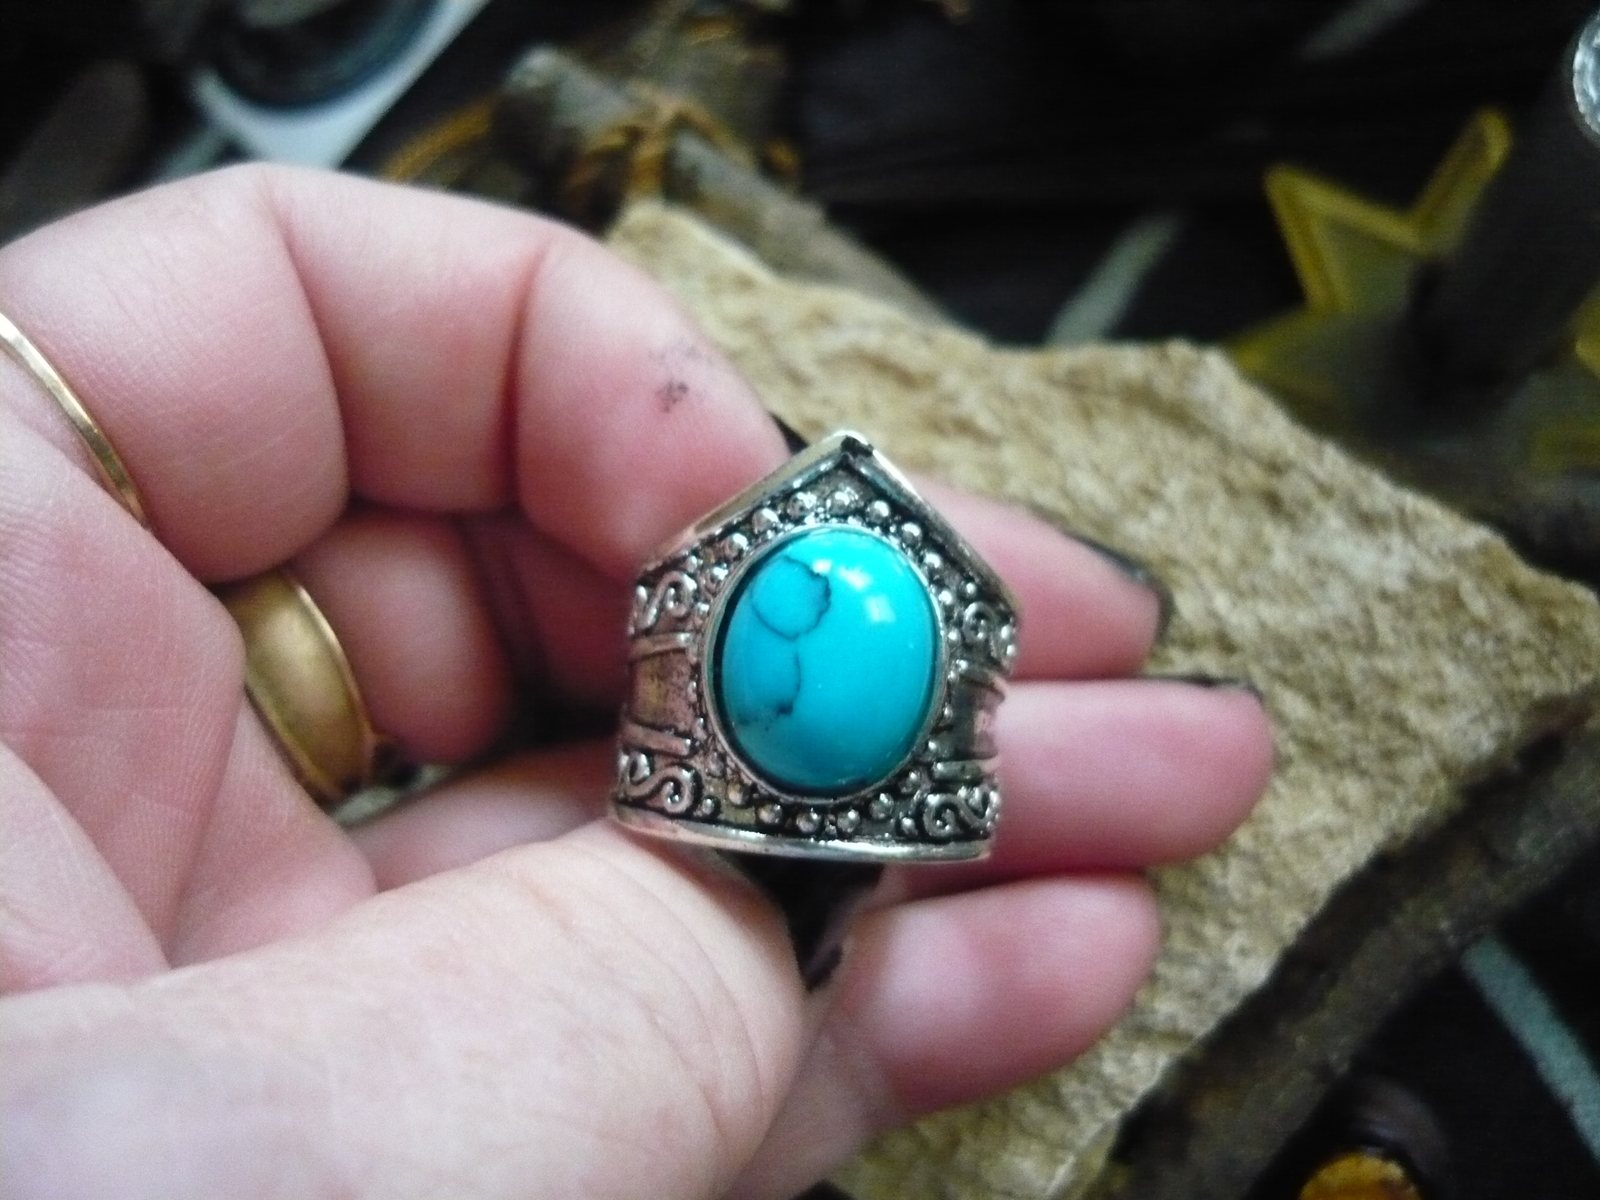 HAUNTED DJINN OF THE PHARAOHS! SIZE 7 - $175.00